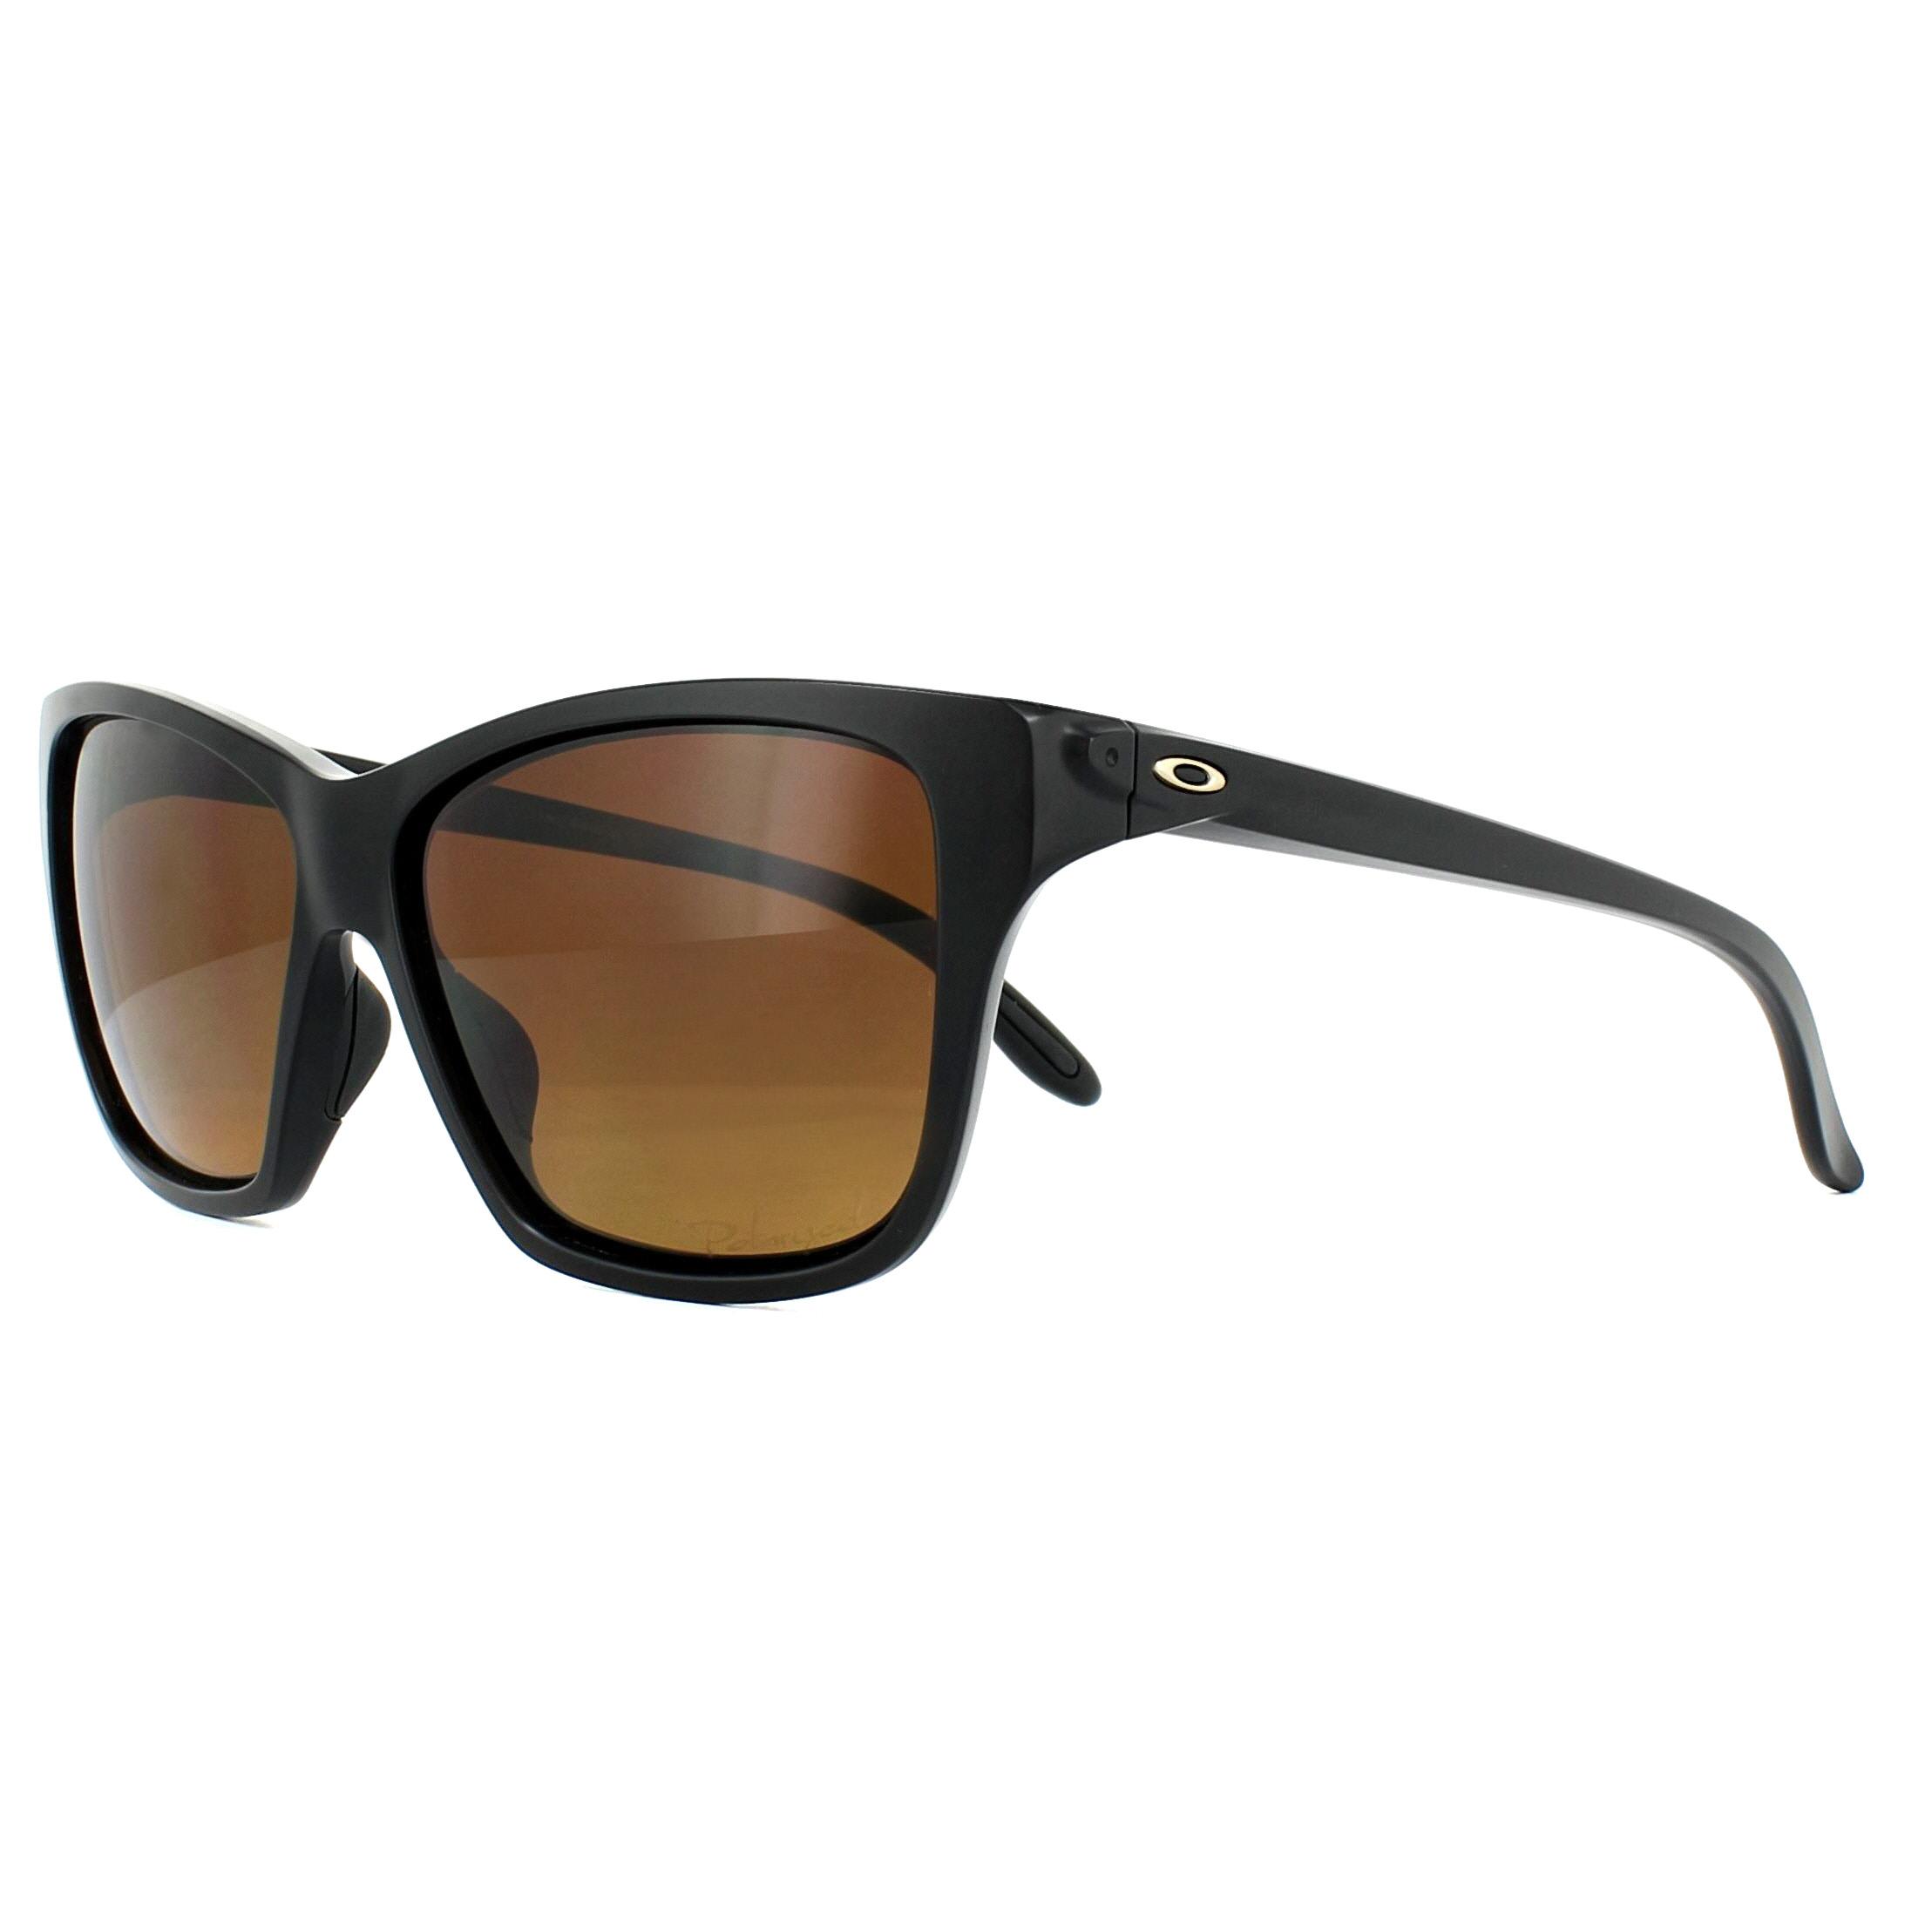 baa72bc7abe28 Sentinel Oakley Sunglasses Hold On OO9298-01 Matt Black Brown Gradient  Polarized